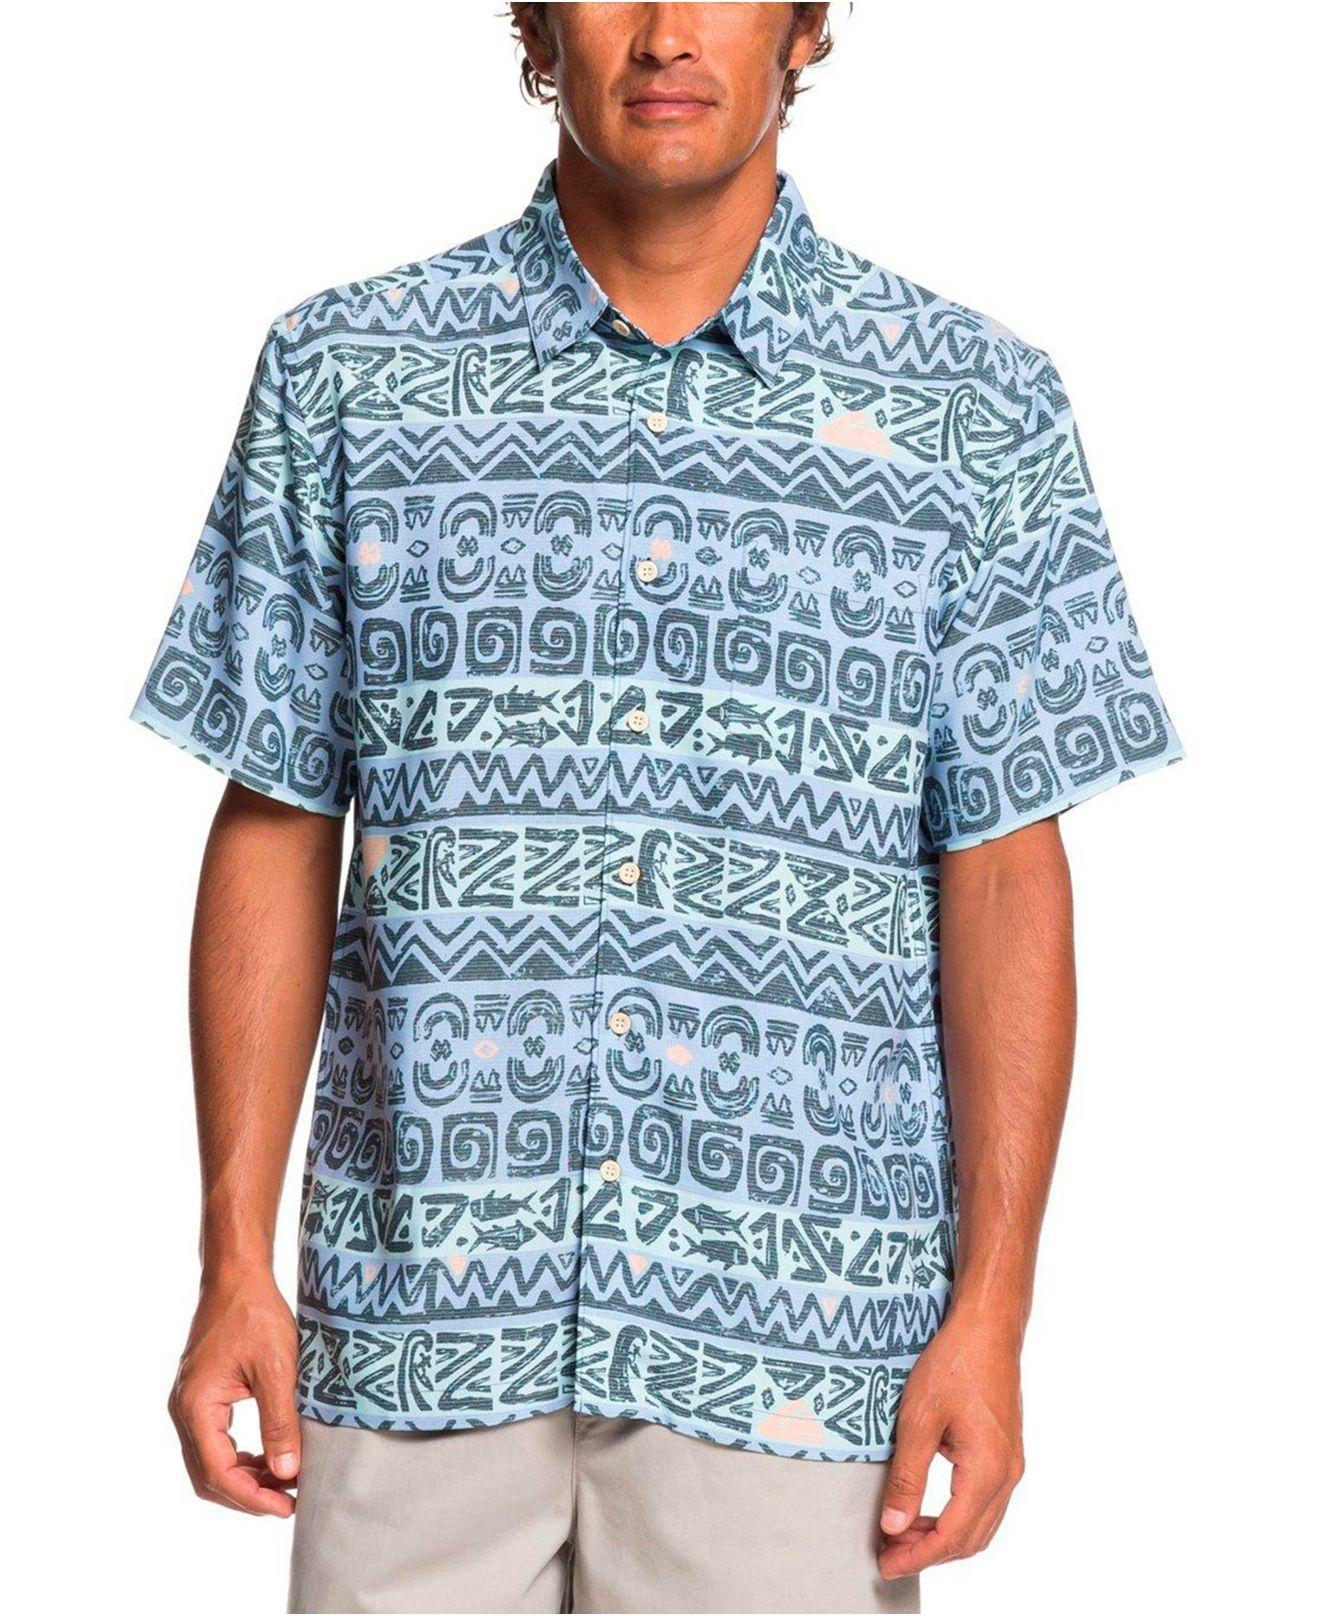 c57b1515b Lyst - Quiksilver Tapa Tapa Shirt in Blue for Men